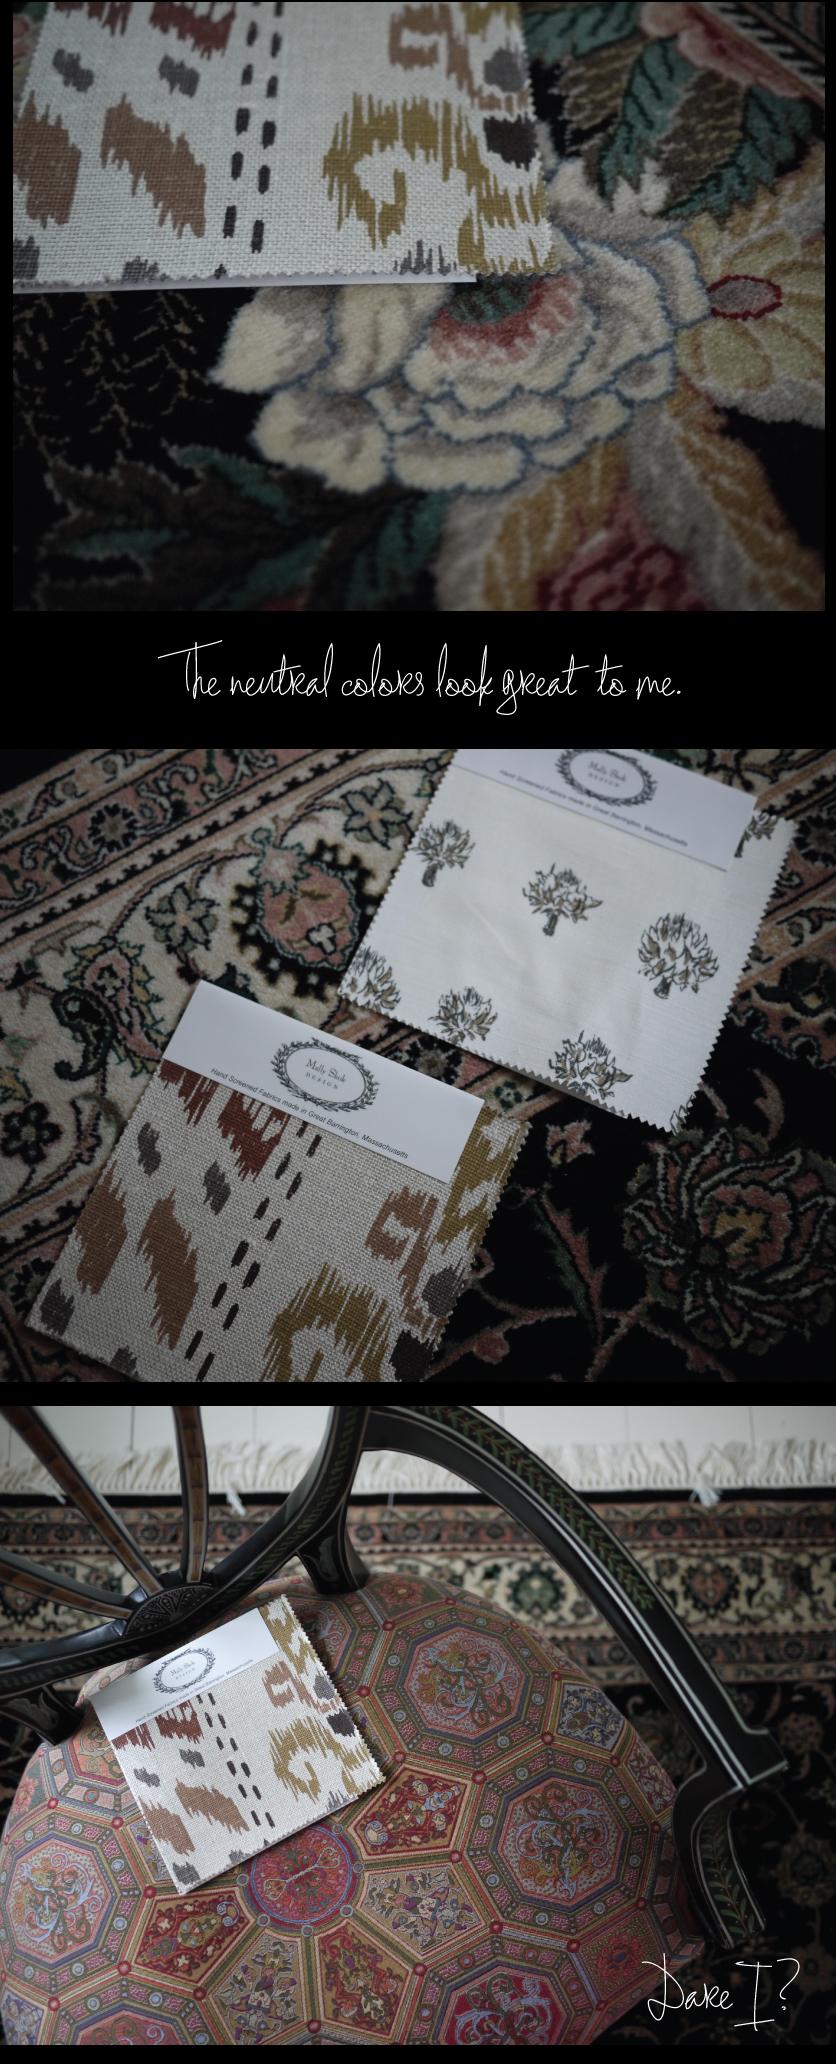 mally-skok-fireplace-room-fabric